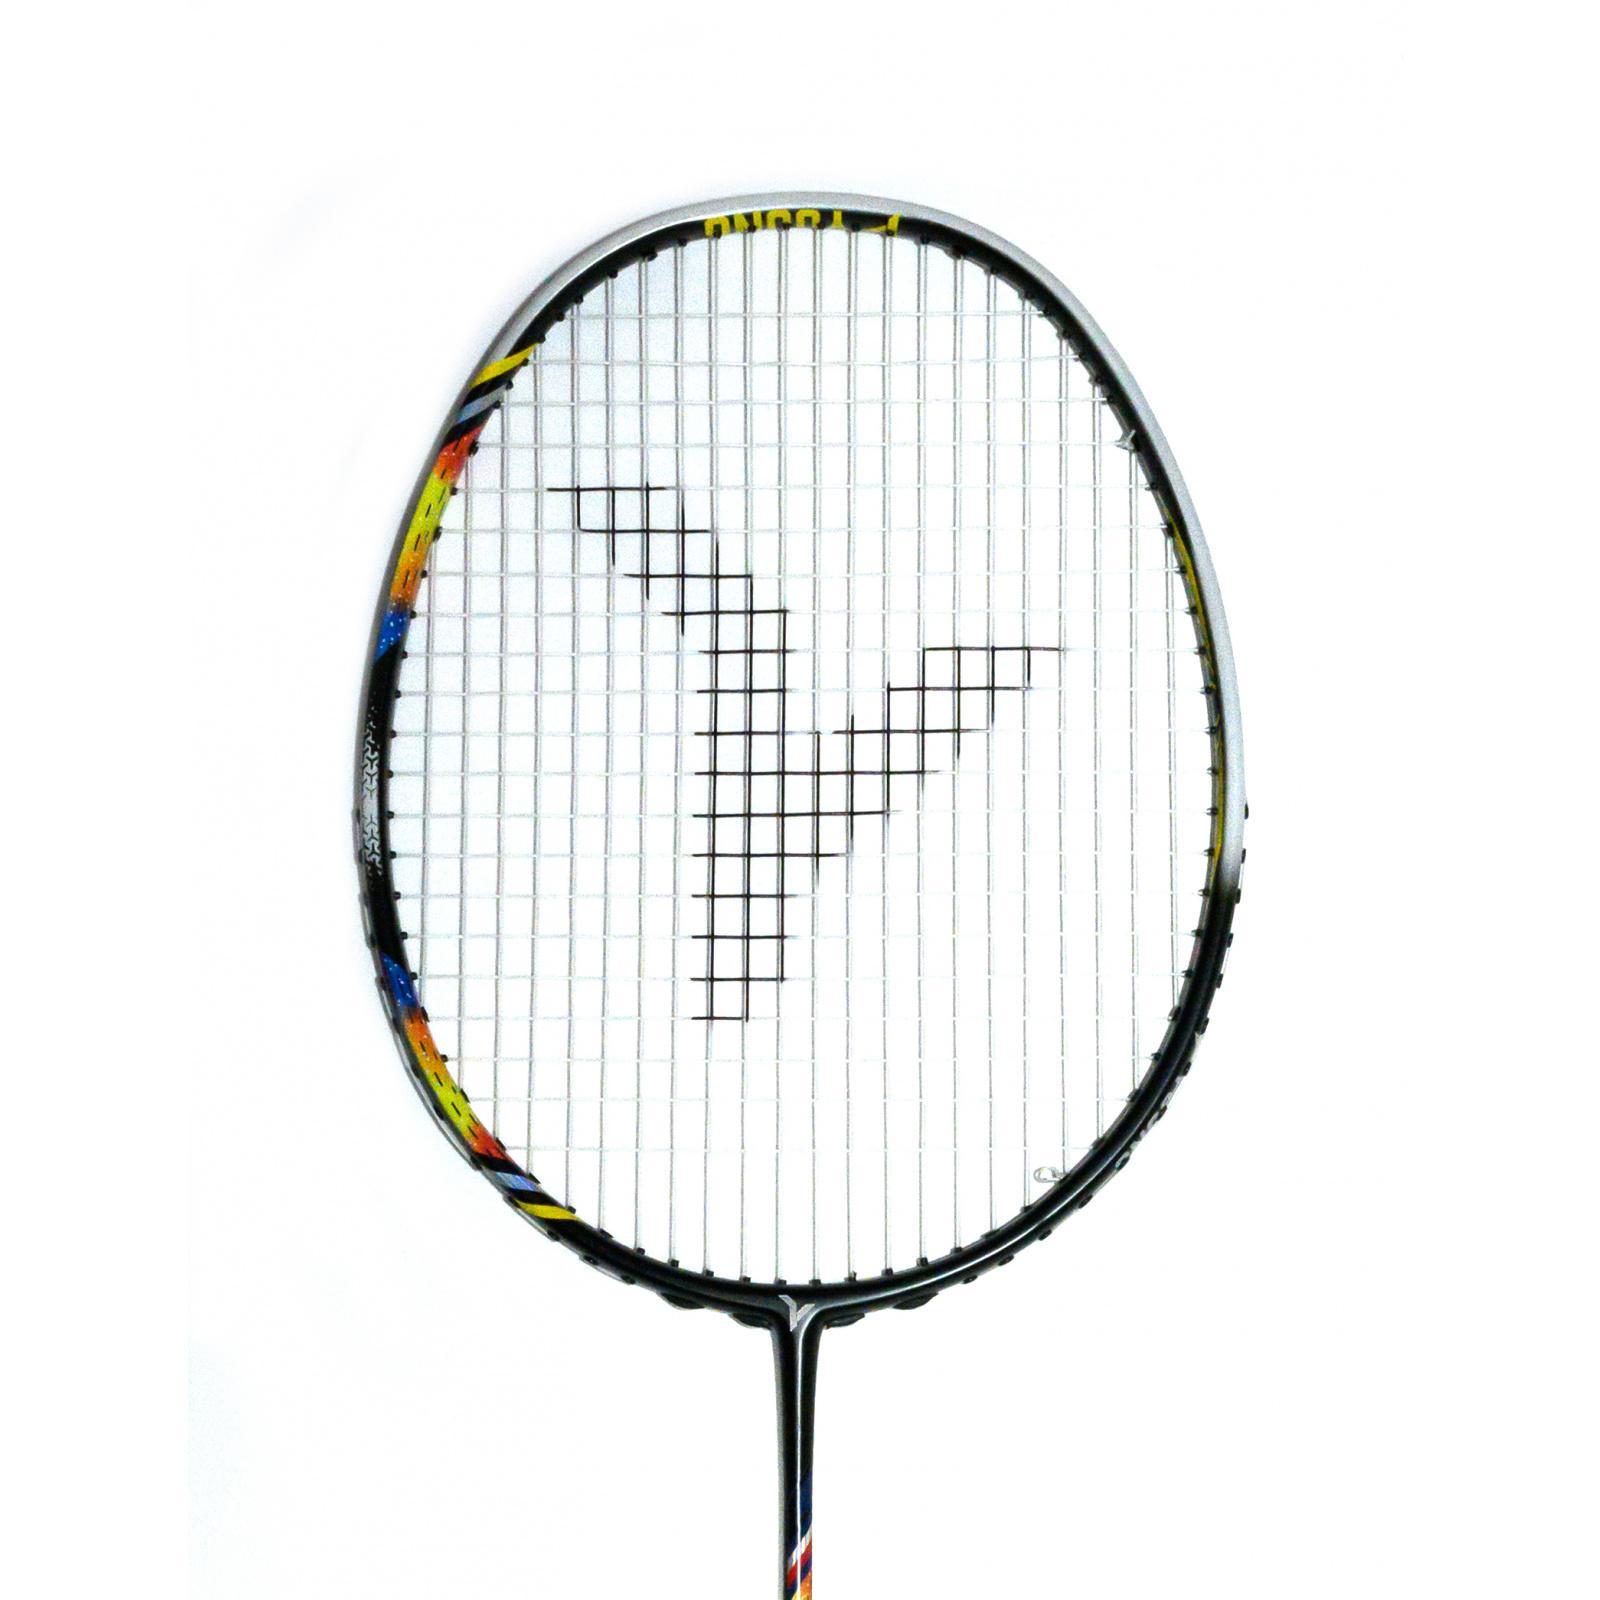 https://www.badec.store/produkty_img/badmintonova-raketa1570047229L.jpg